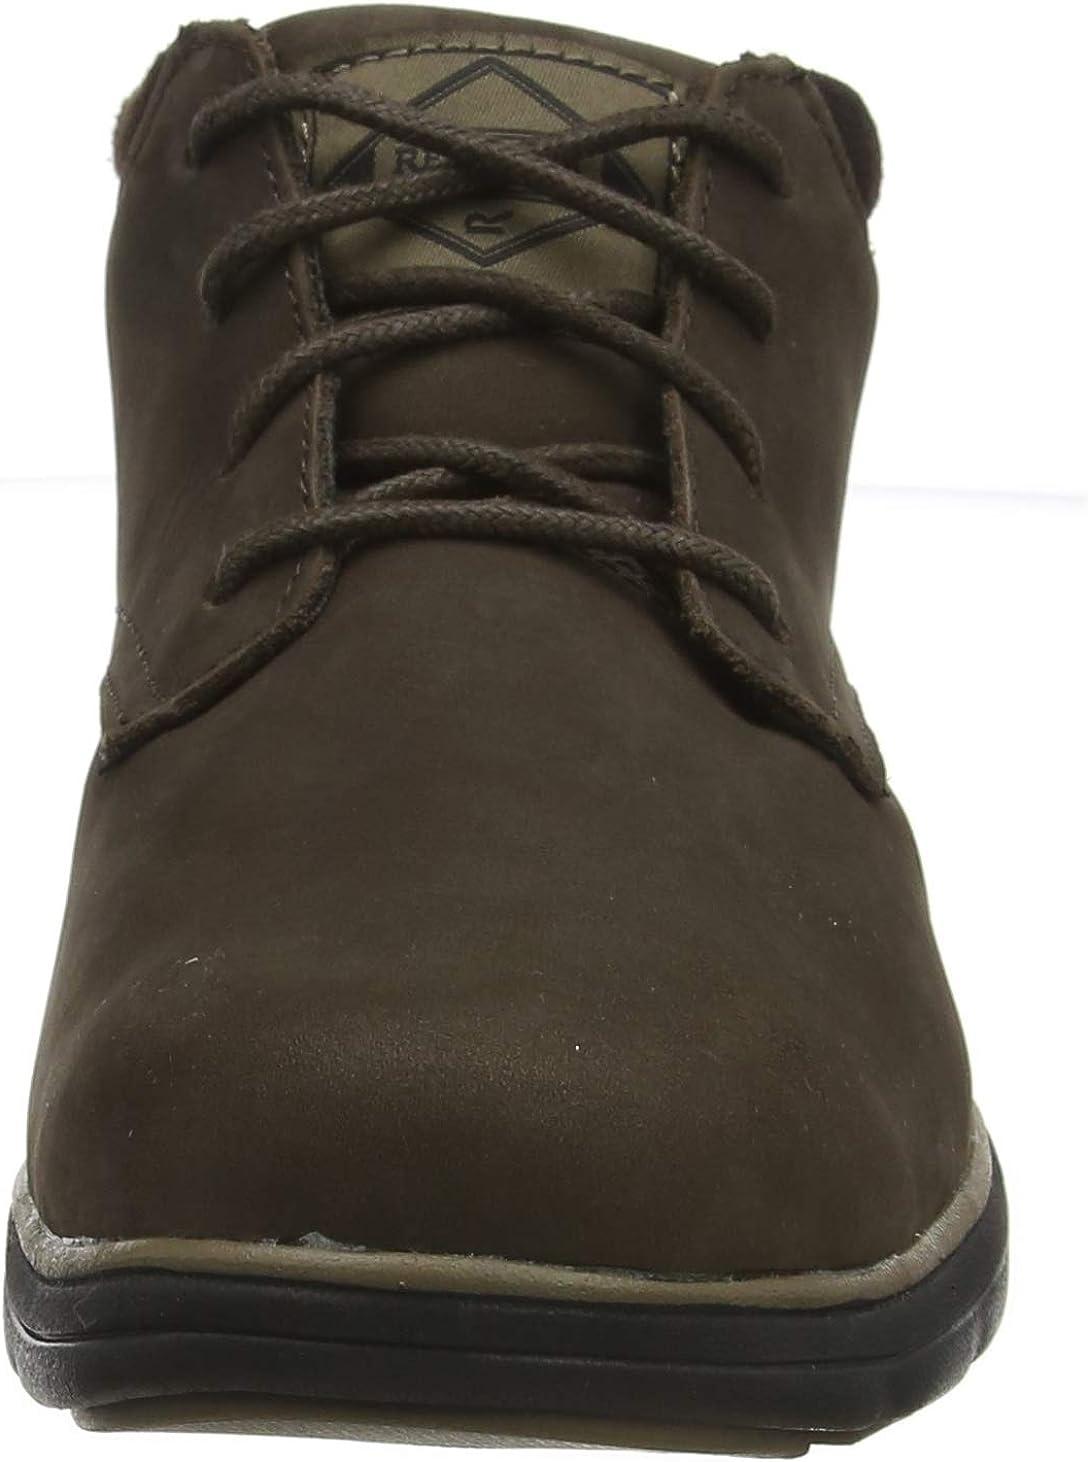 men's brockhurst casual boots peat off